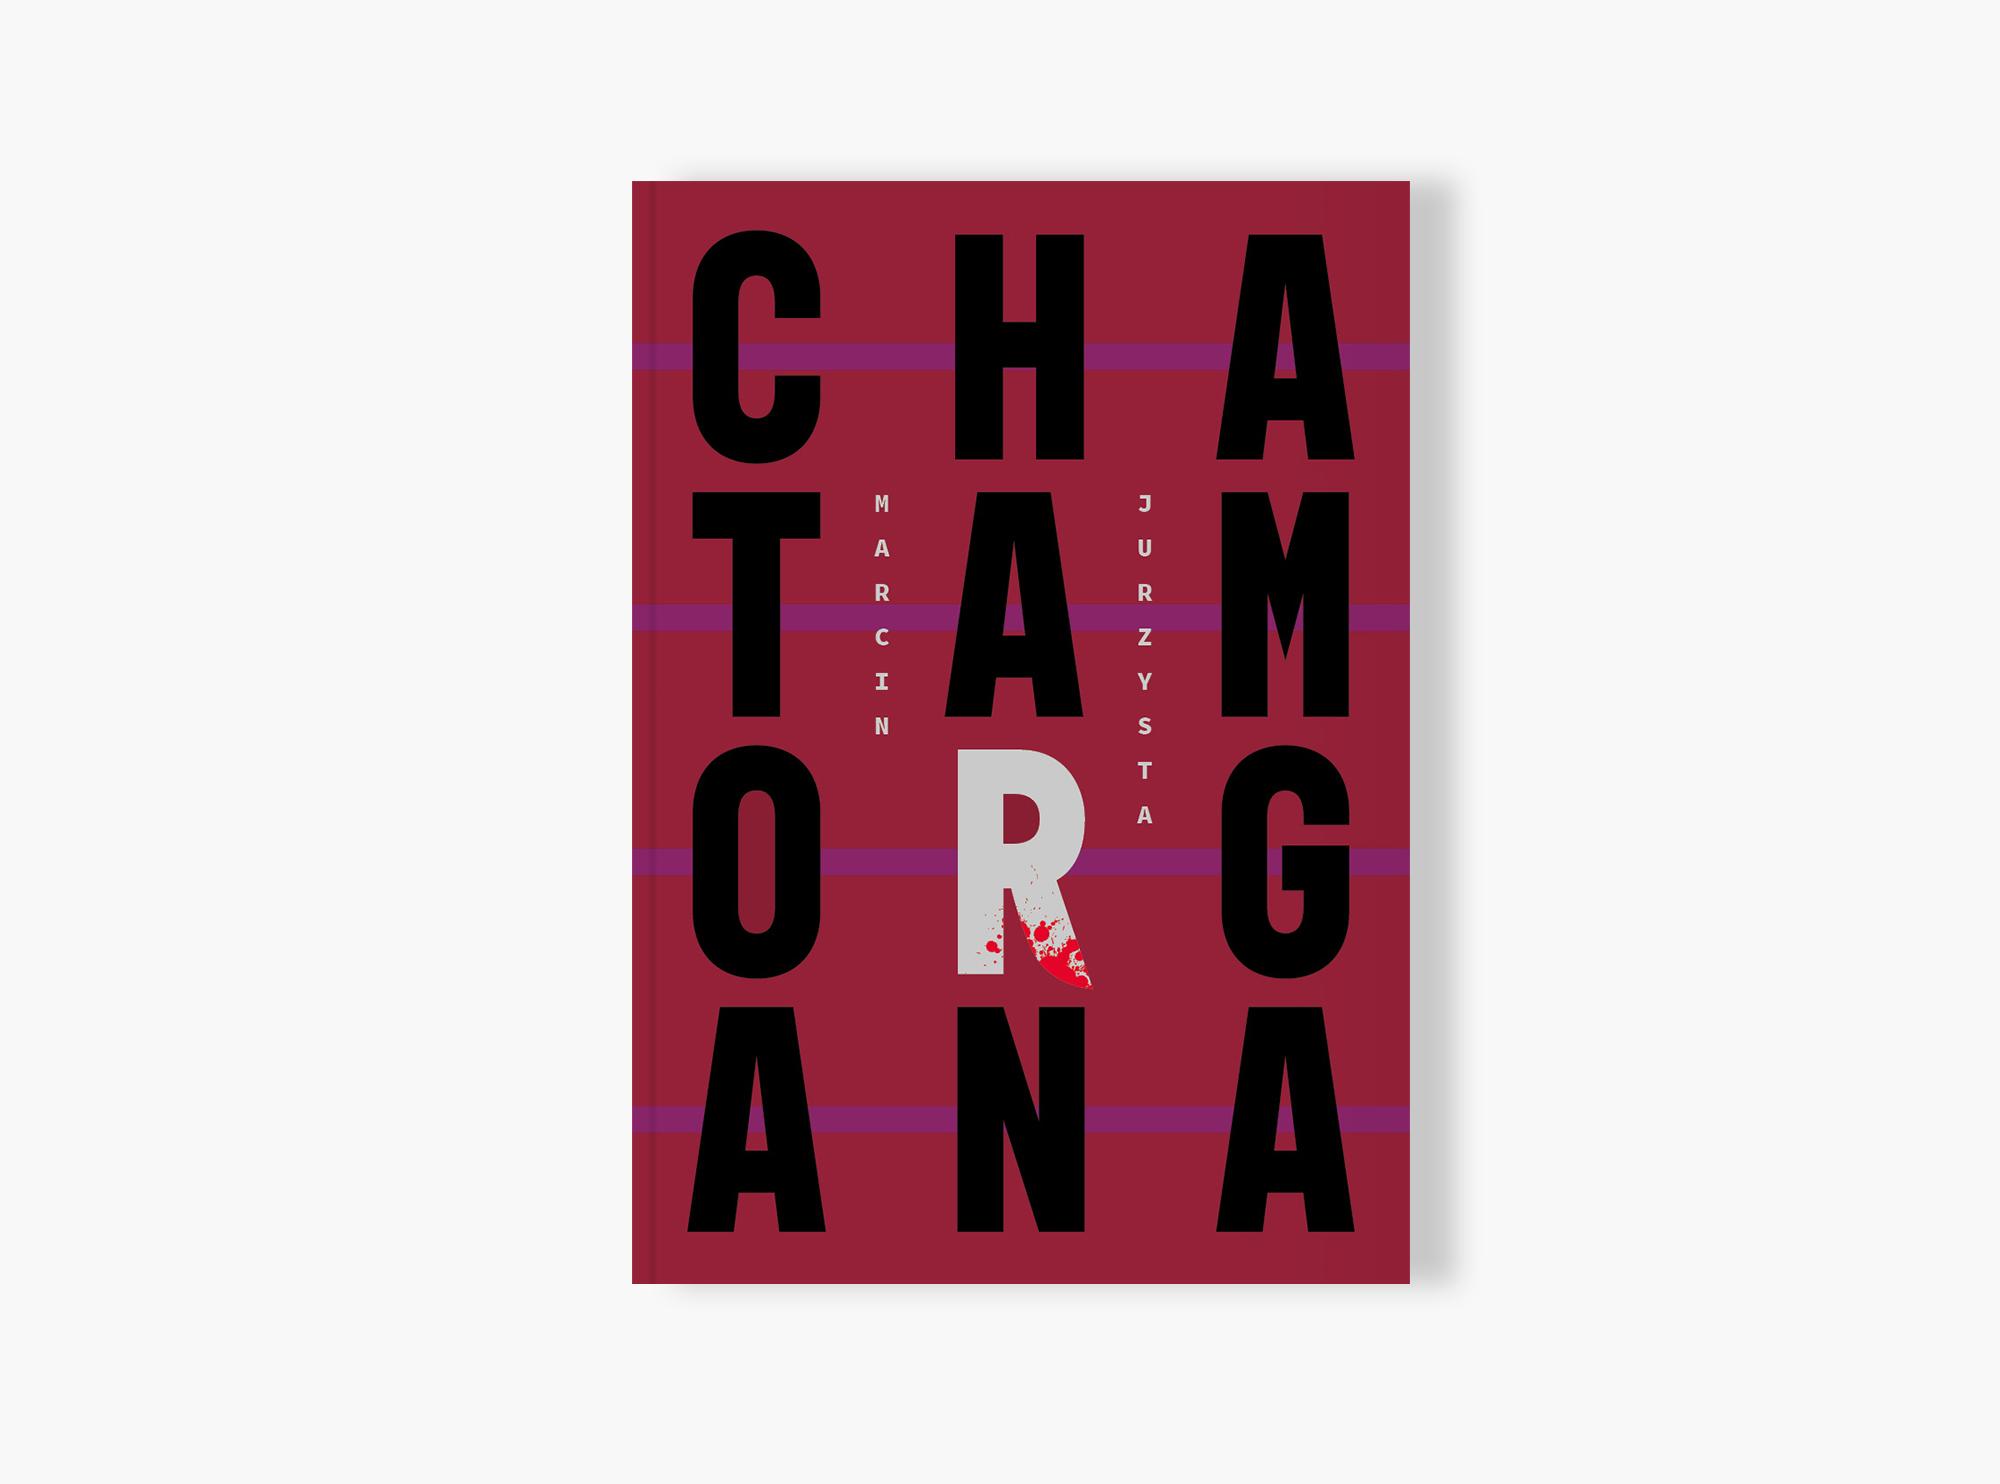 Chatamorgana